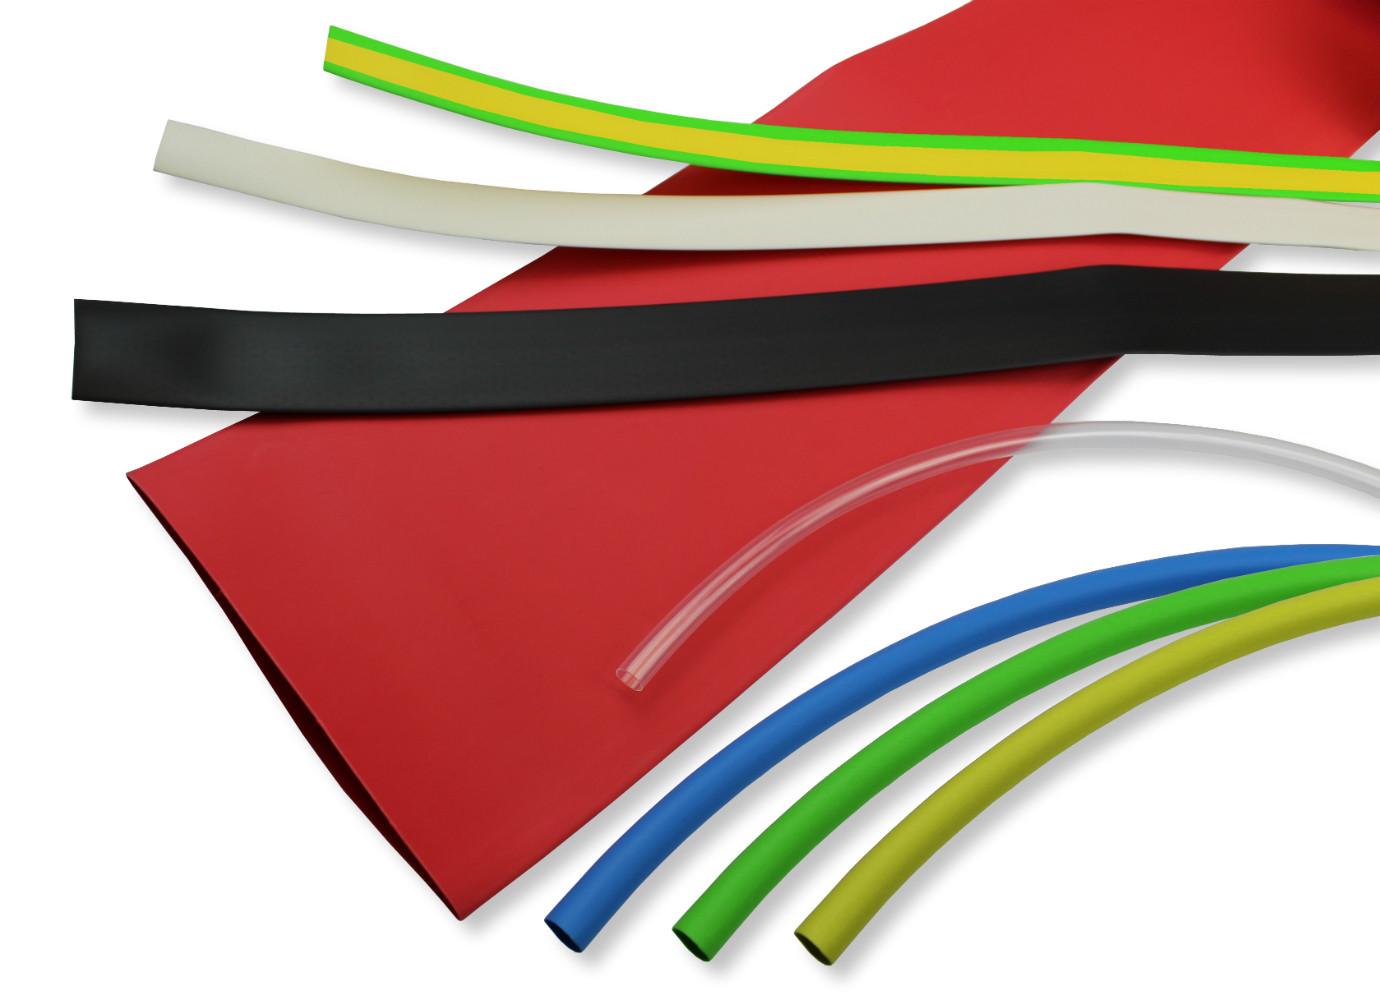 Heat Shrink Tubing 3:1 Ratio HSP3 size 3.0mm I.D / 1.0mm I.D Black